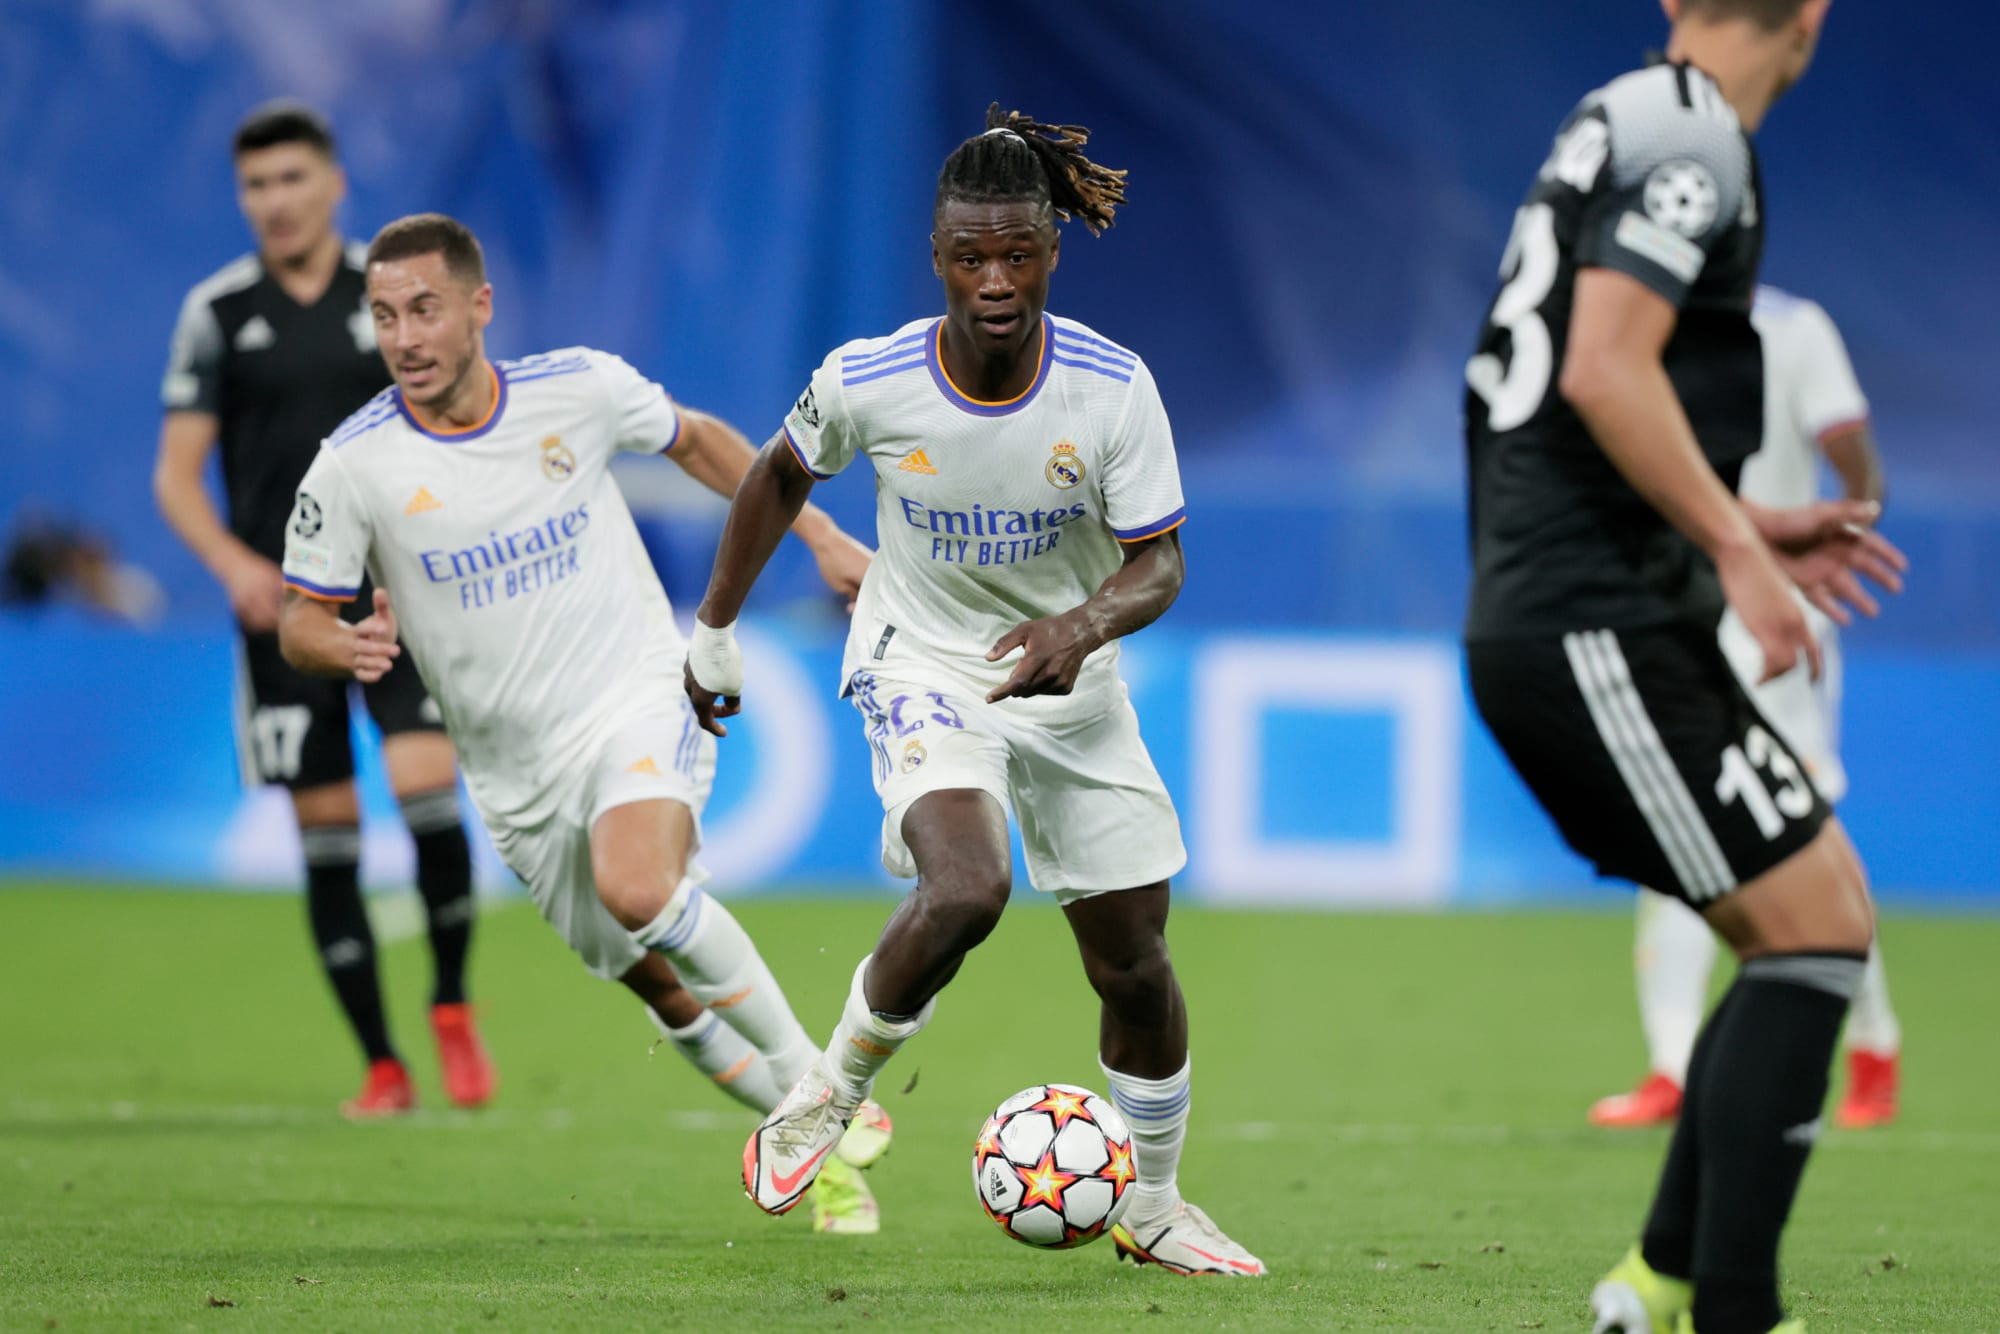 Real Madrid: What will help Eduardo Camavinga's development the most